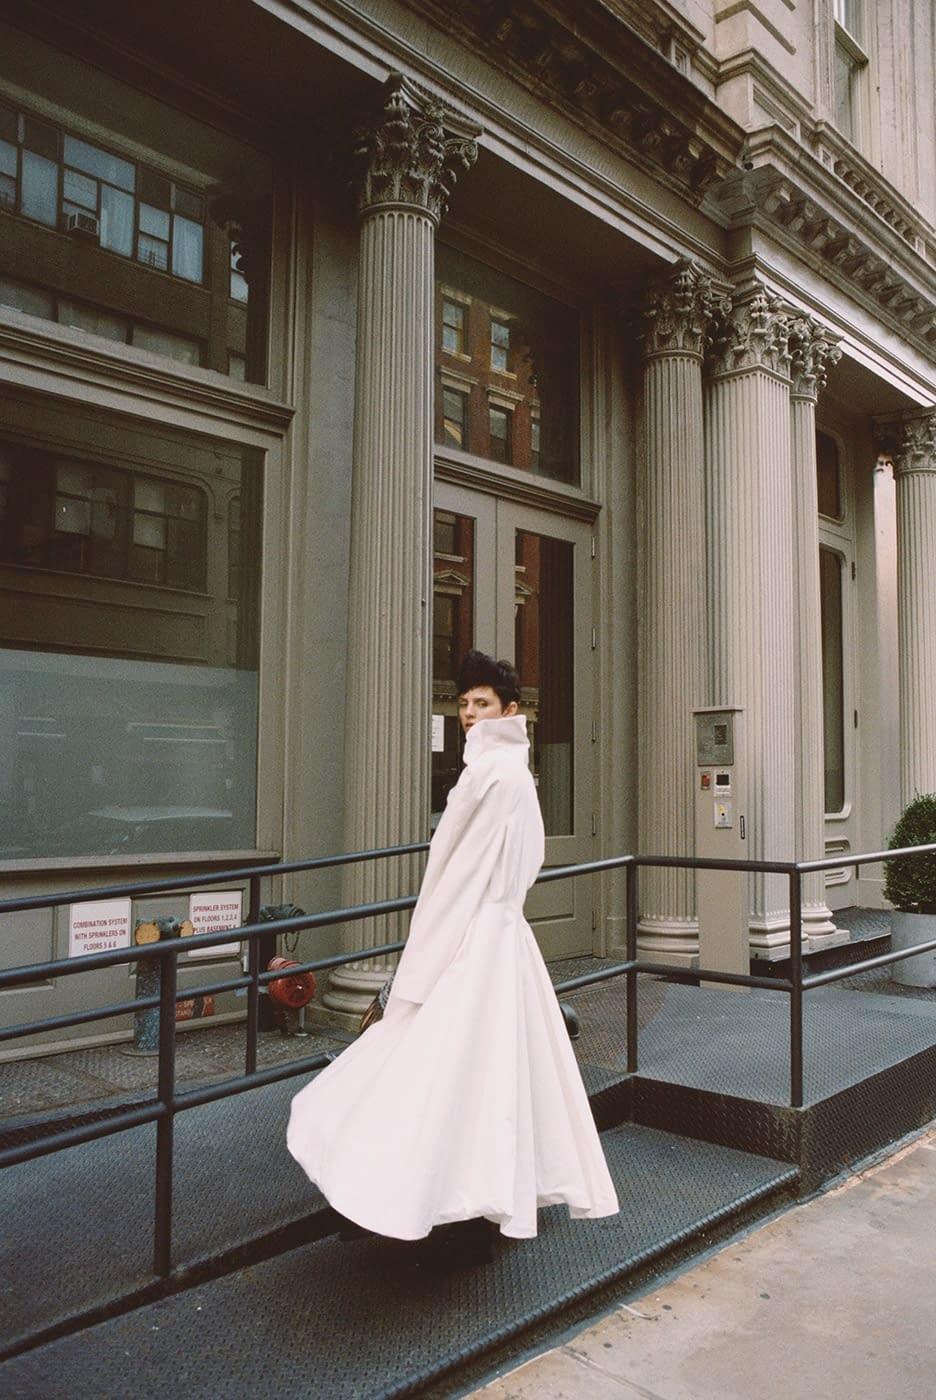 New York Stories 2 photo Enric Galceran - 20